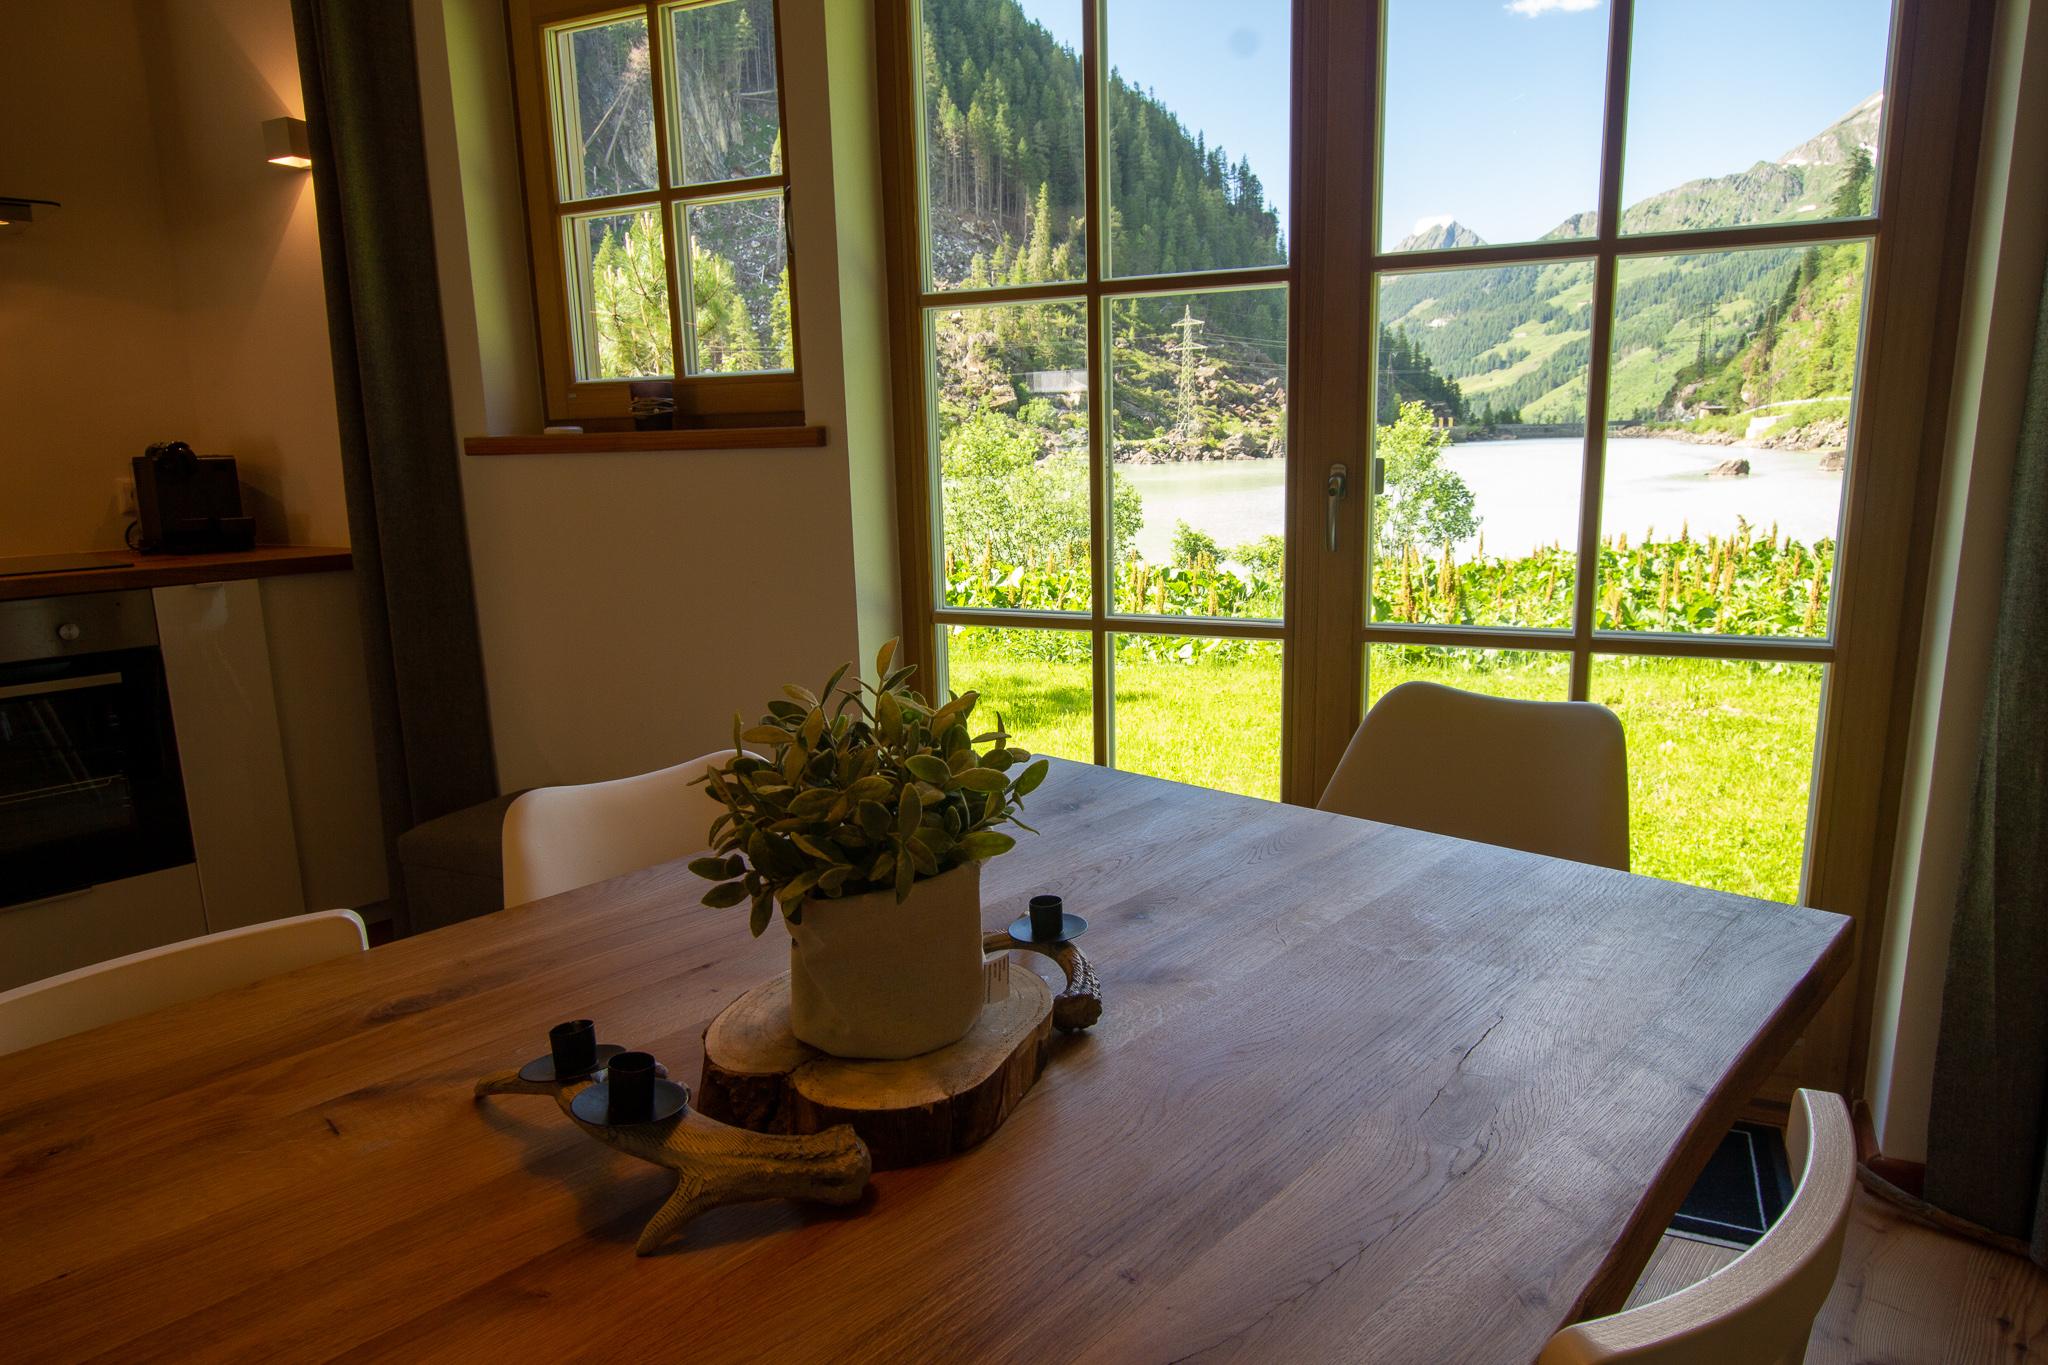 Maison de vacances Lodge Seeblick am Skilift und Bergsee für 5 (2636751), Uttendorf, Pinzgau, Salzbourg, Autriche, image 29